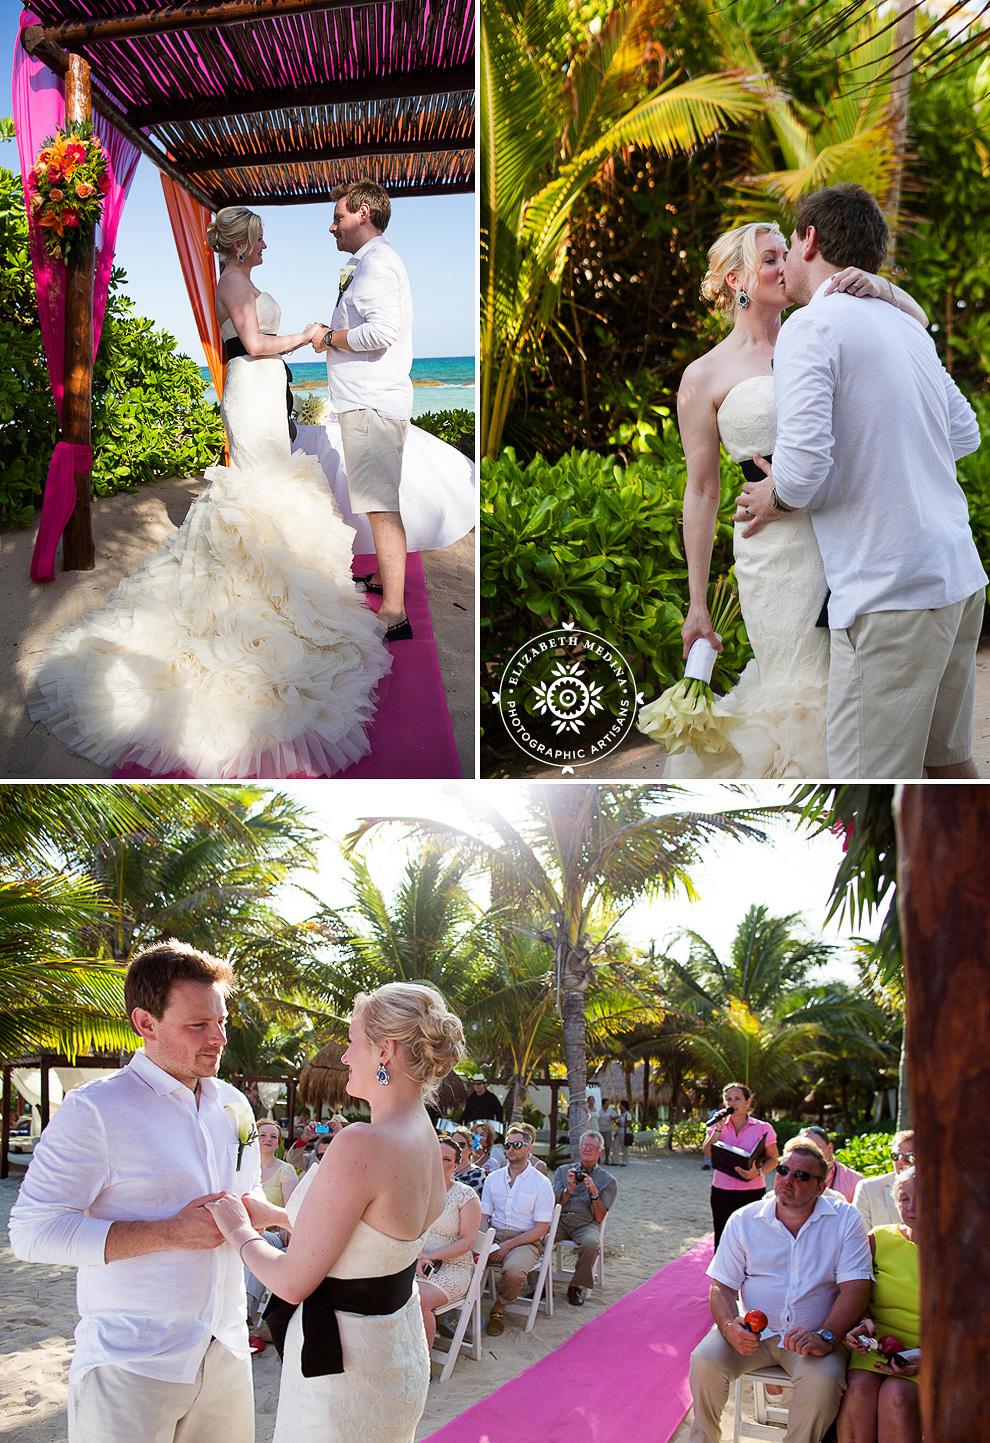 el_dorado_royale_wedding_photographer_mexico_emedina_017 El Dorado Royale Wedding Photography, Becky and Ant's Destination Wedding   04 15 2014